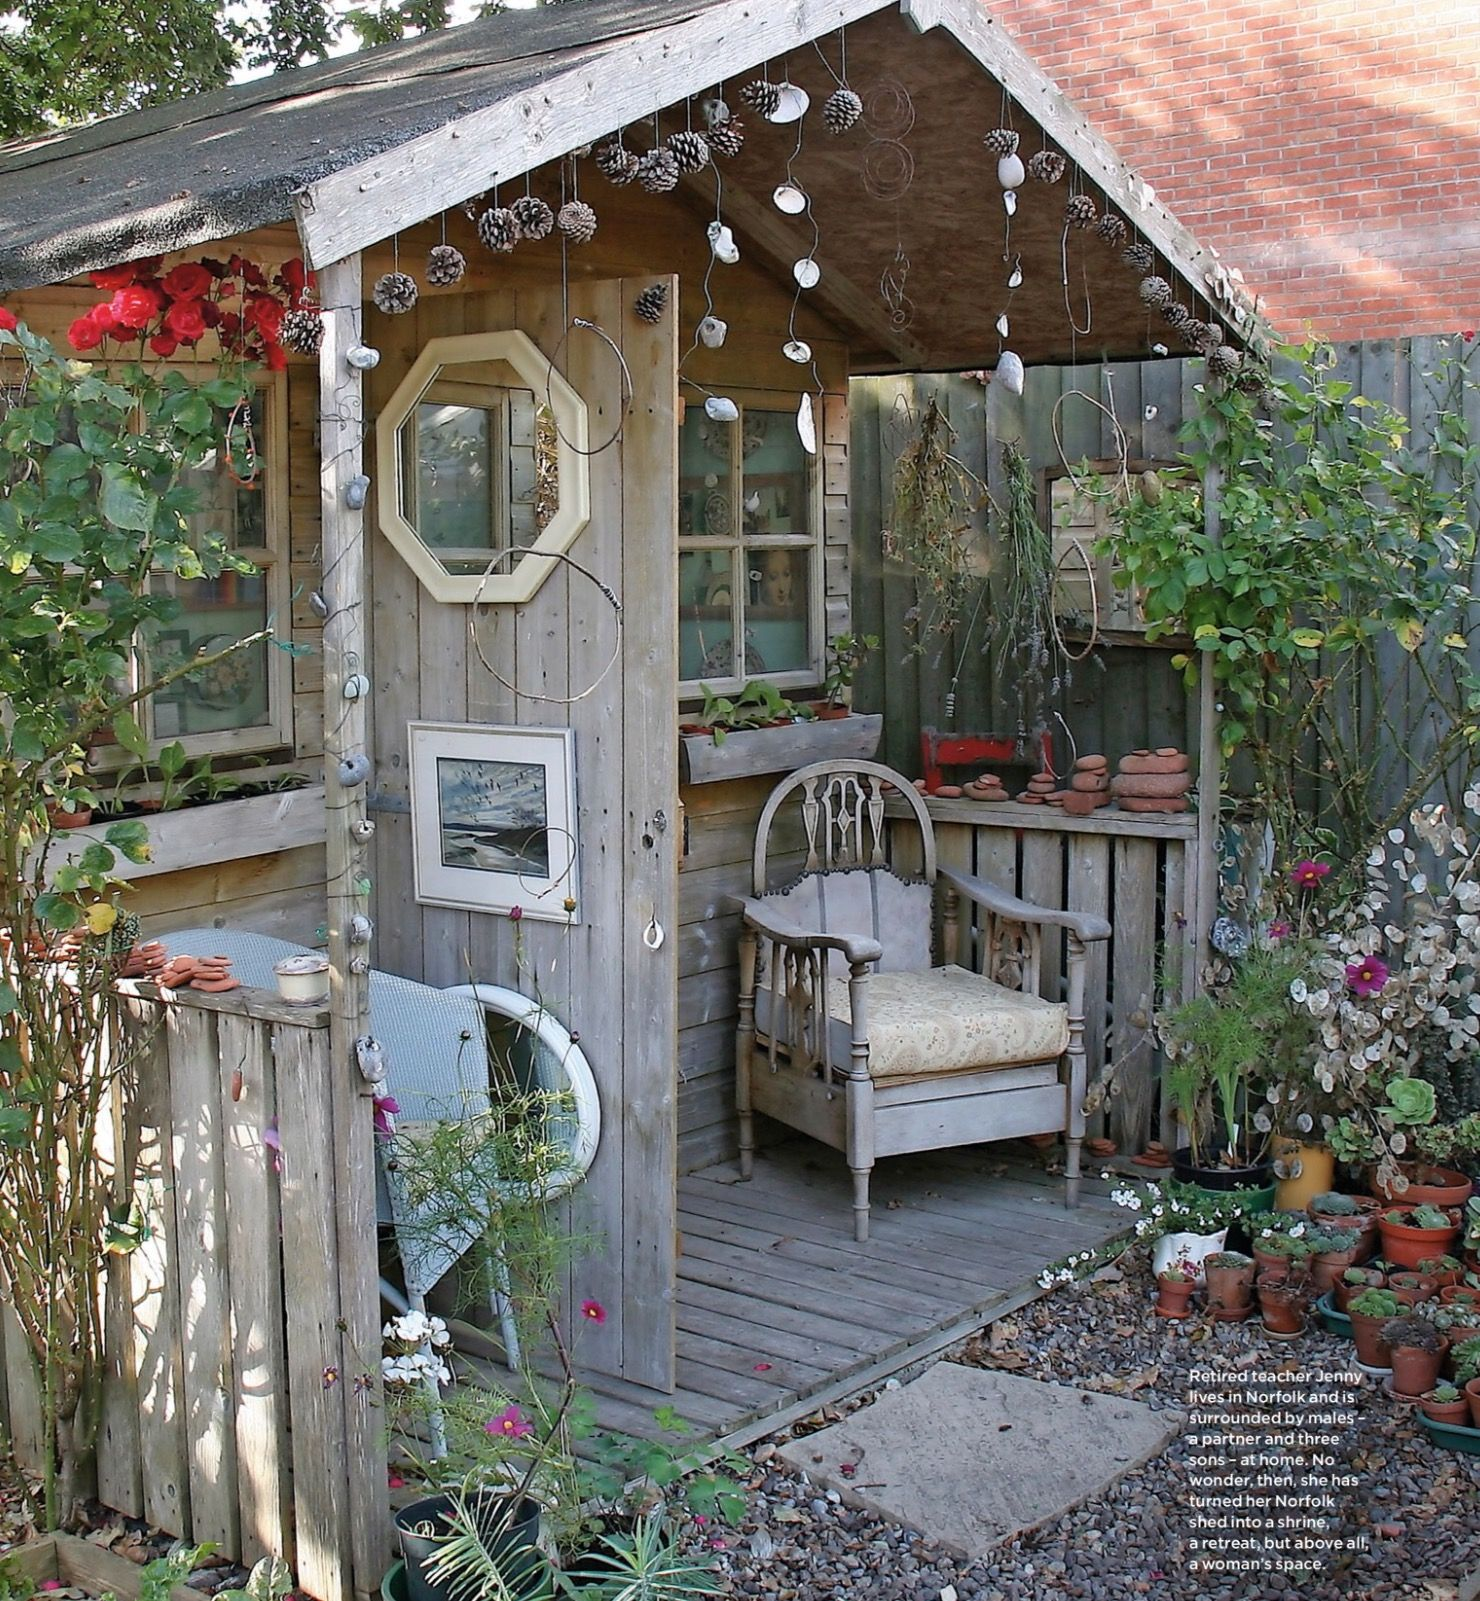 435274b67aa49a605c08e1424b304734 - Kaos Wife And The Black Gardeners Part 3